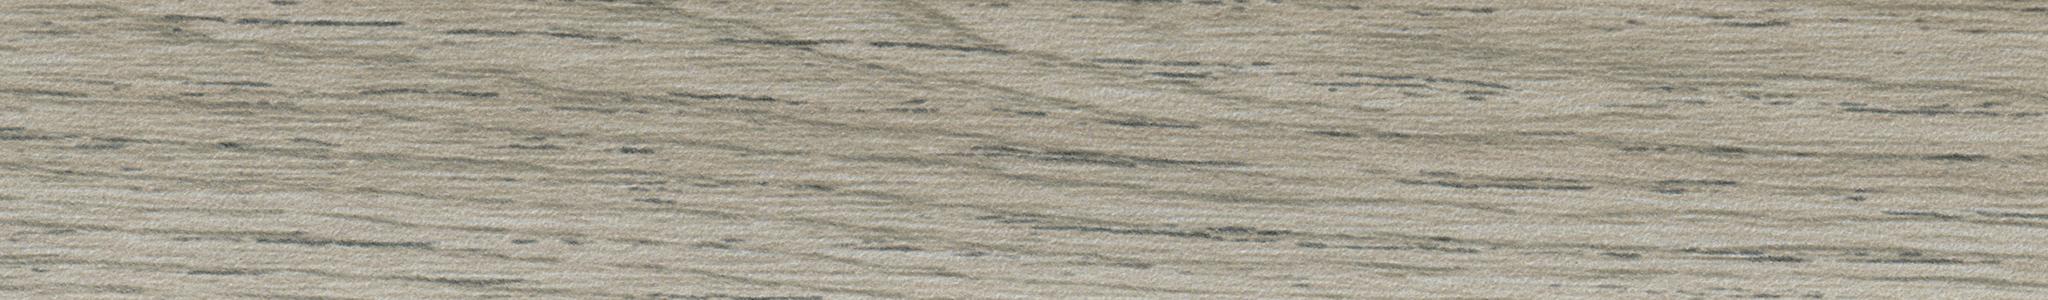 HD 241399 ABS hrana dub lanýž perla